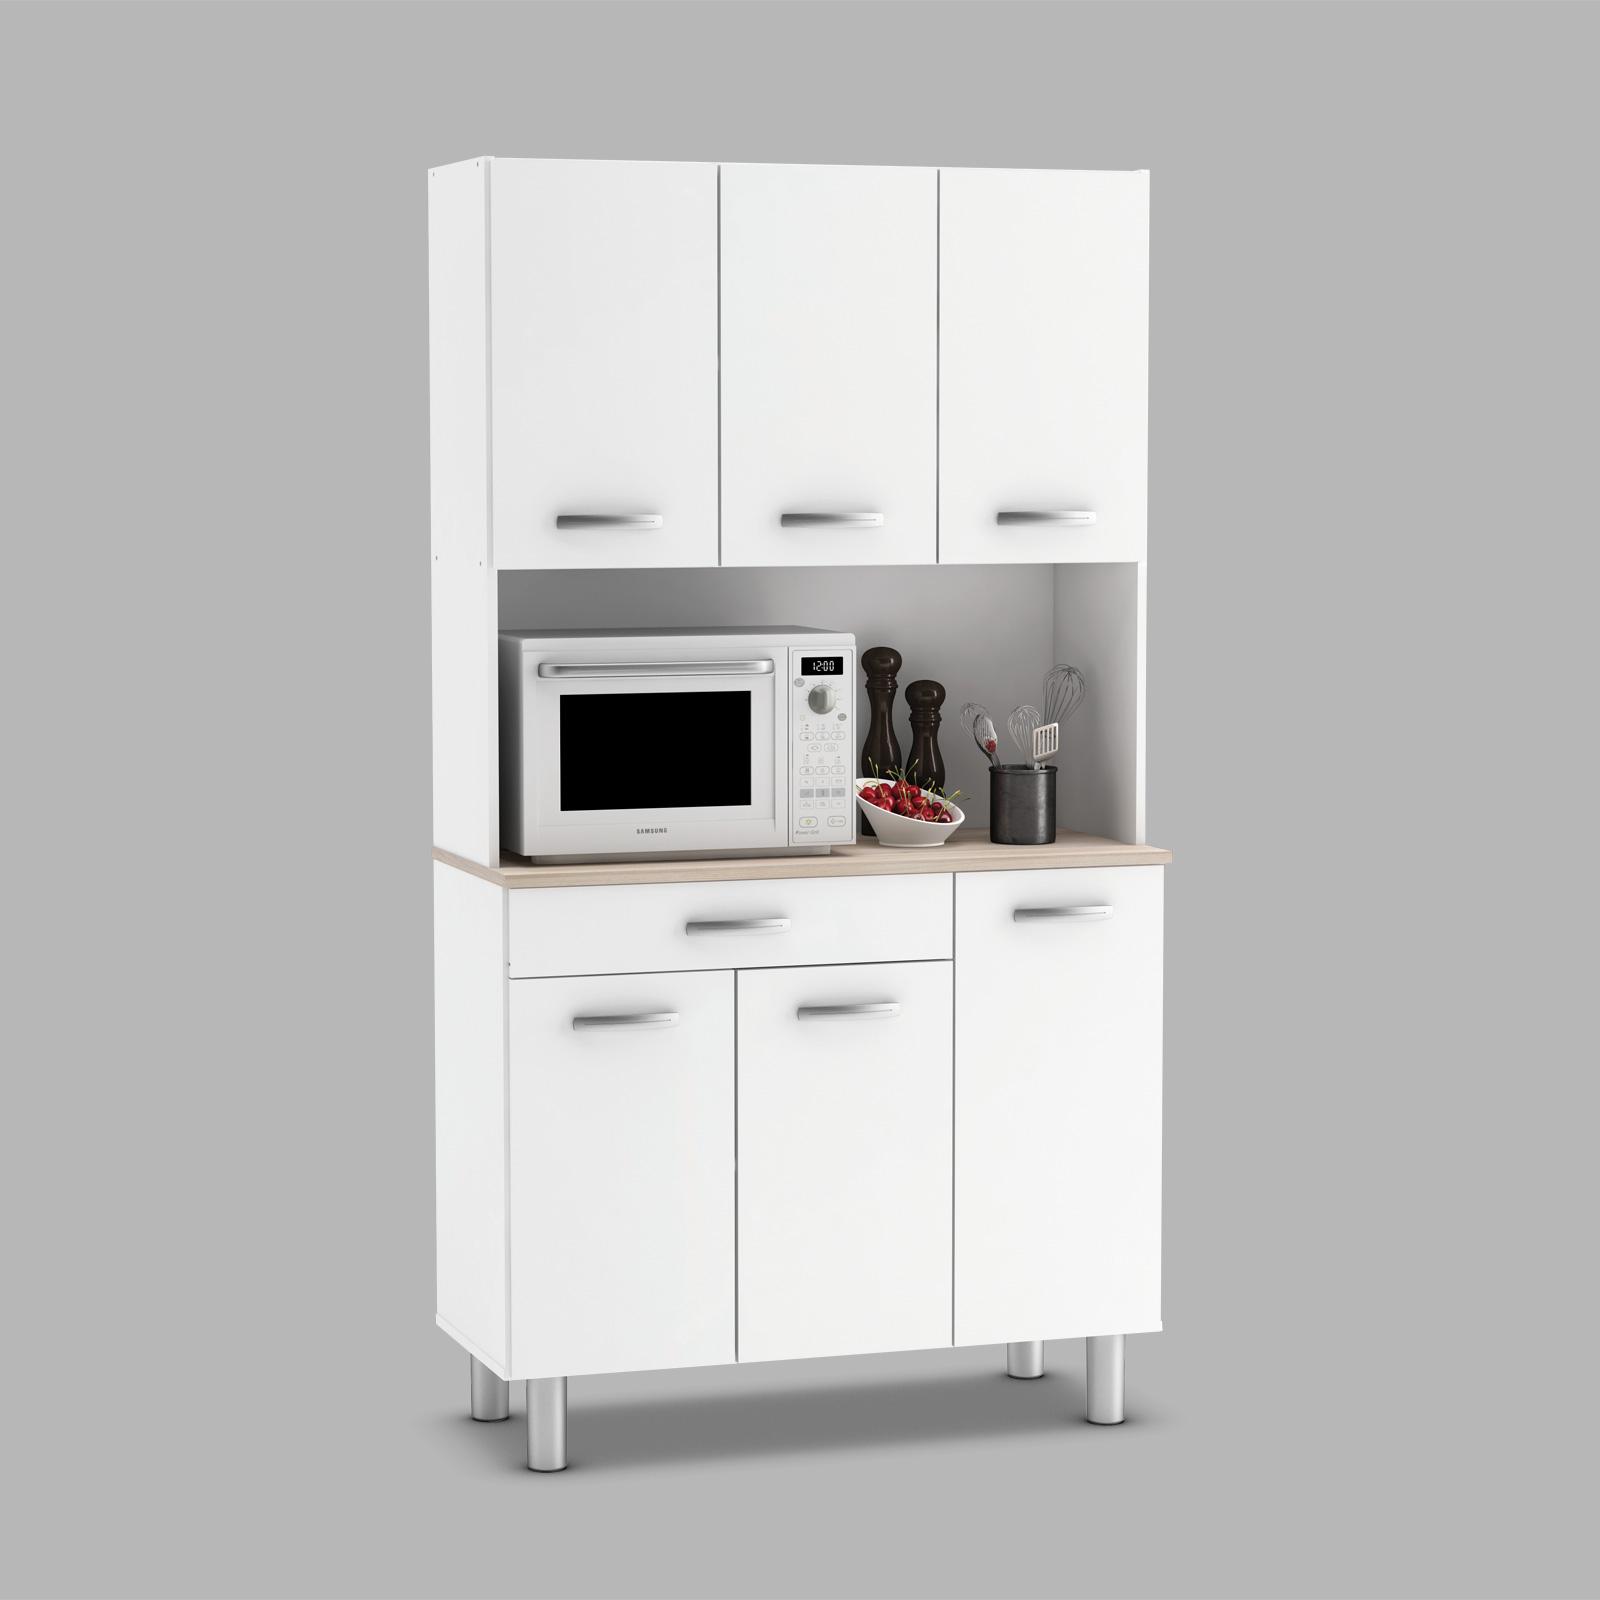 k chenbuffet pasta buffet k chenschrank schrank highboard. Black Bedroom Furniture Sets. Home Design Ideas